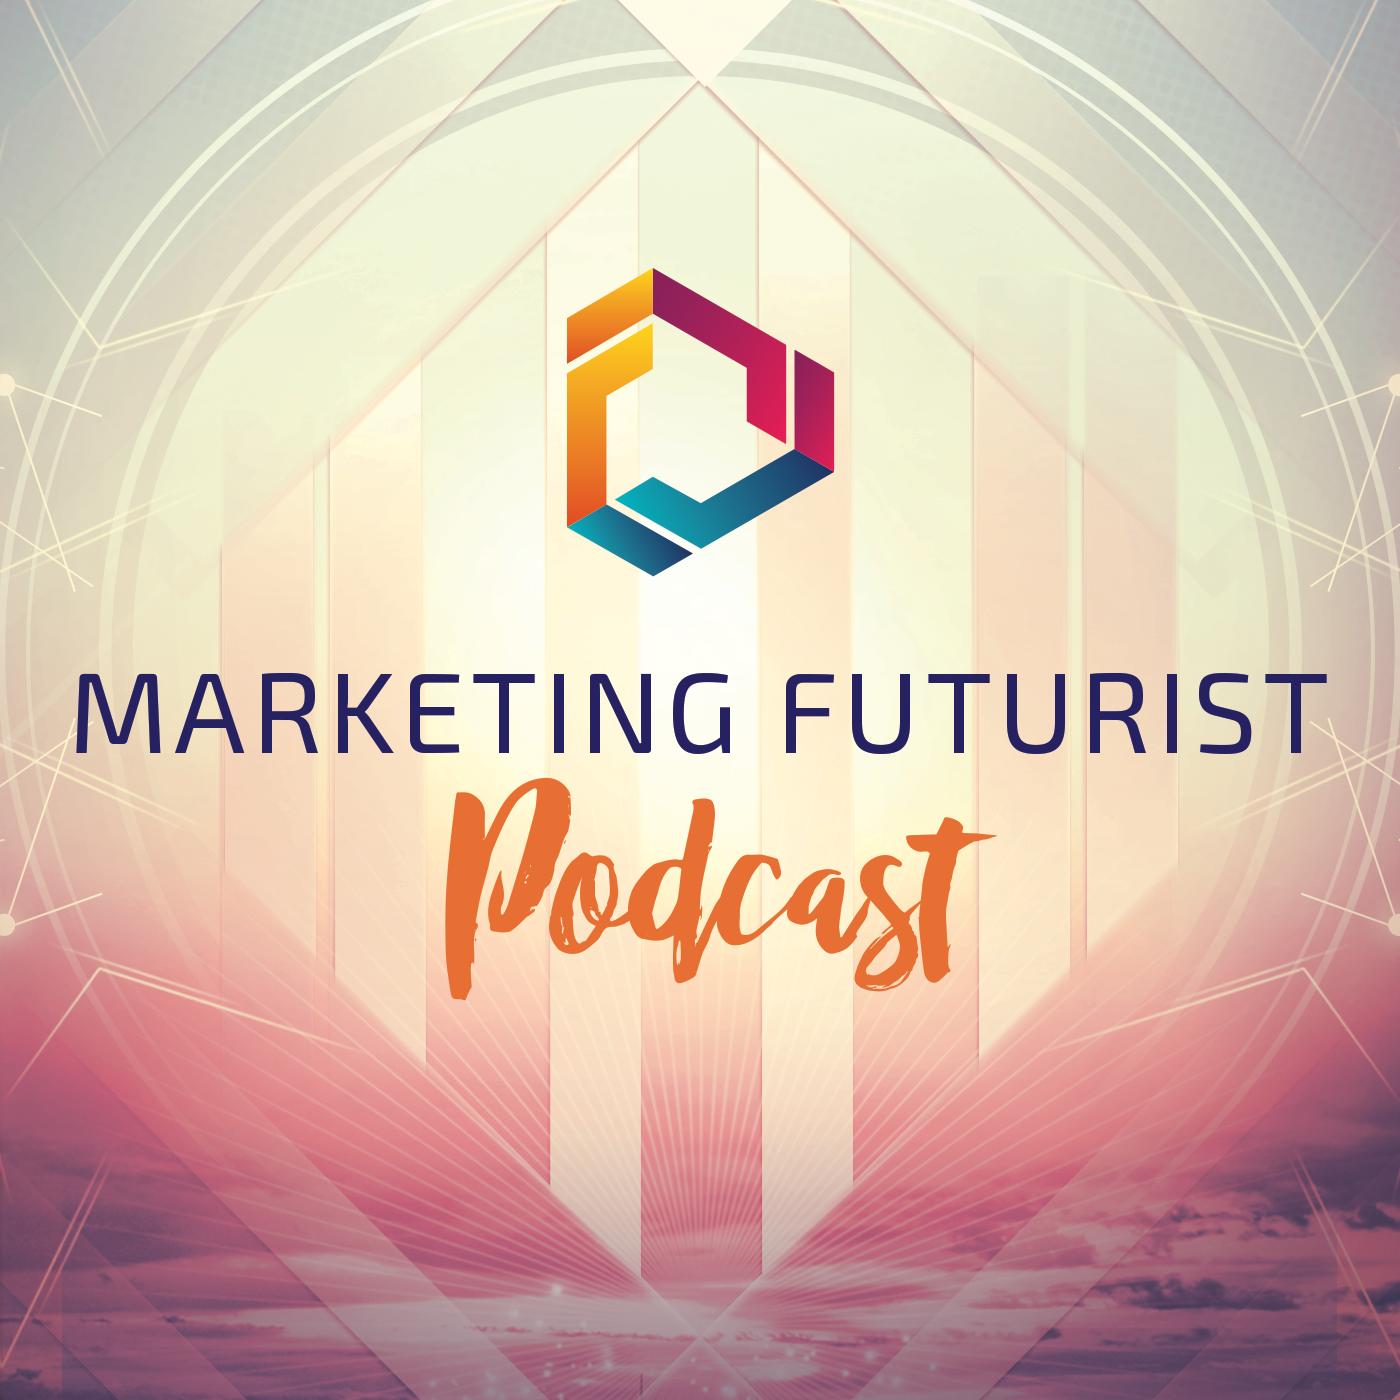 The Marketing Futurist Podcast